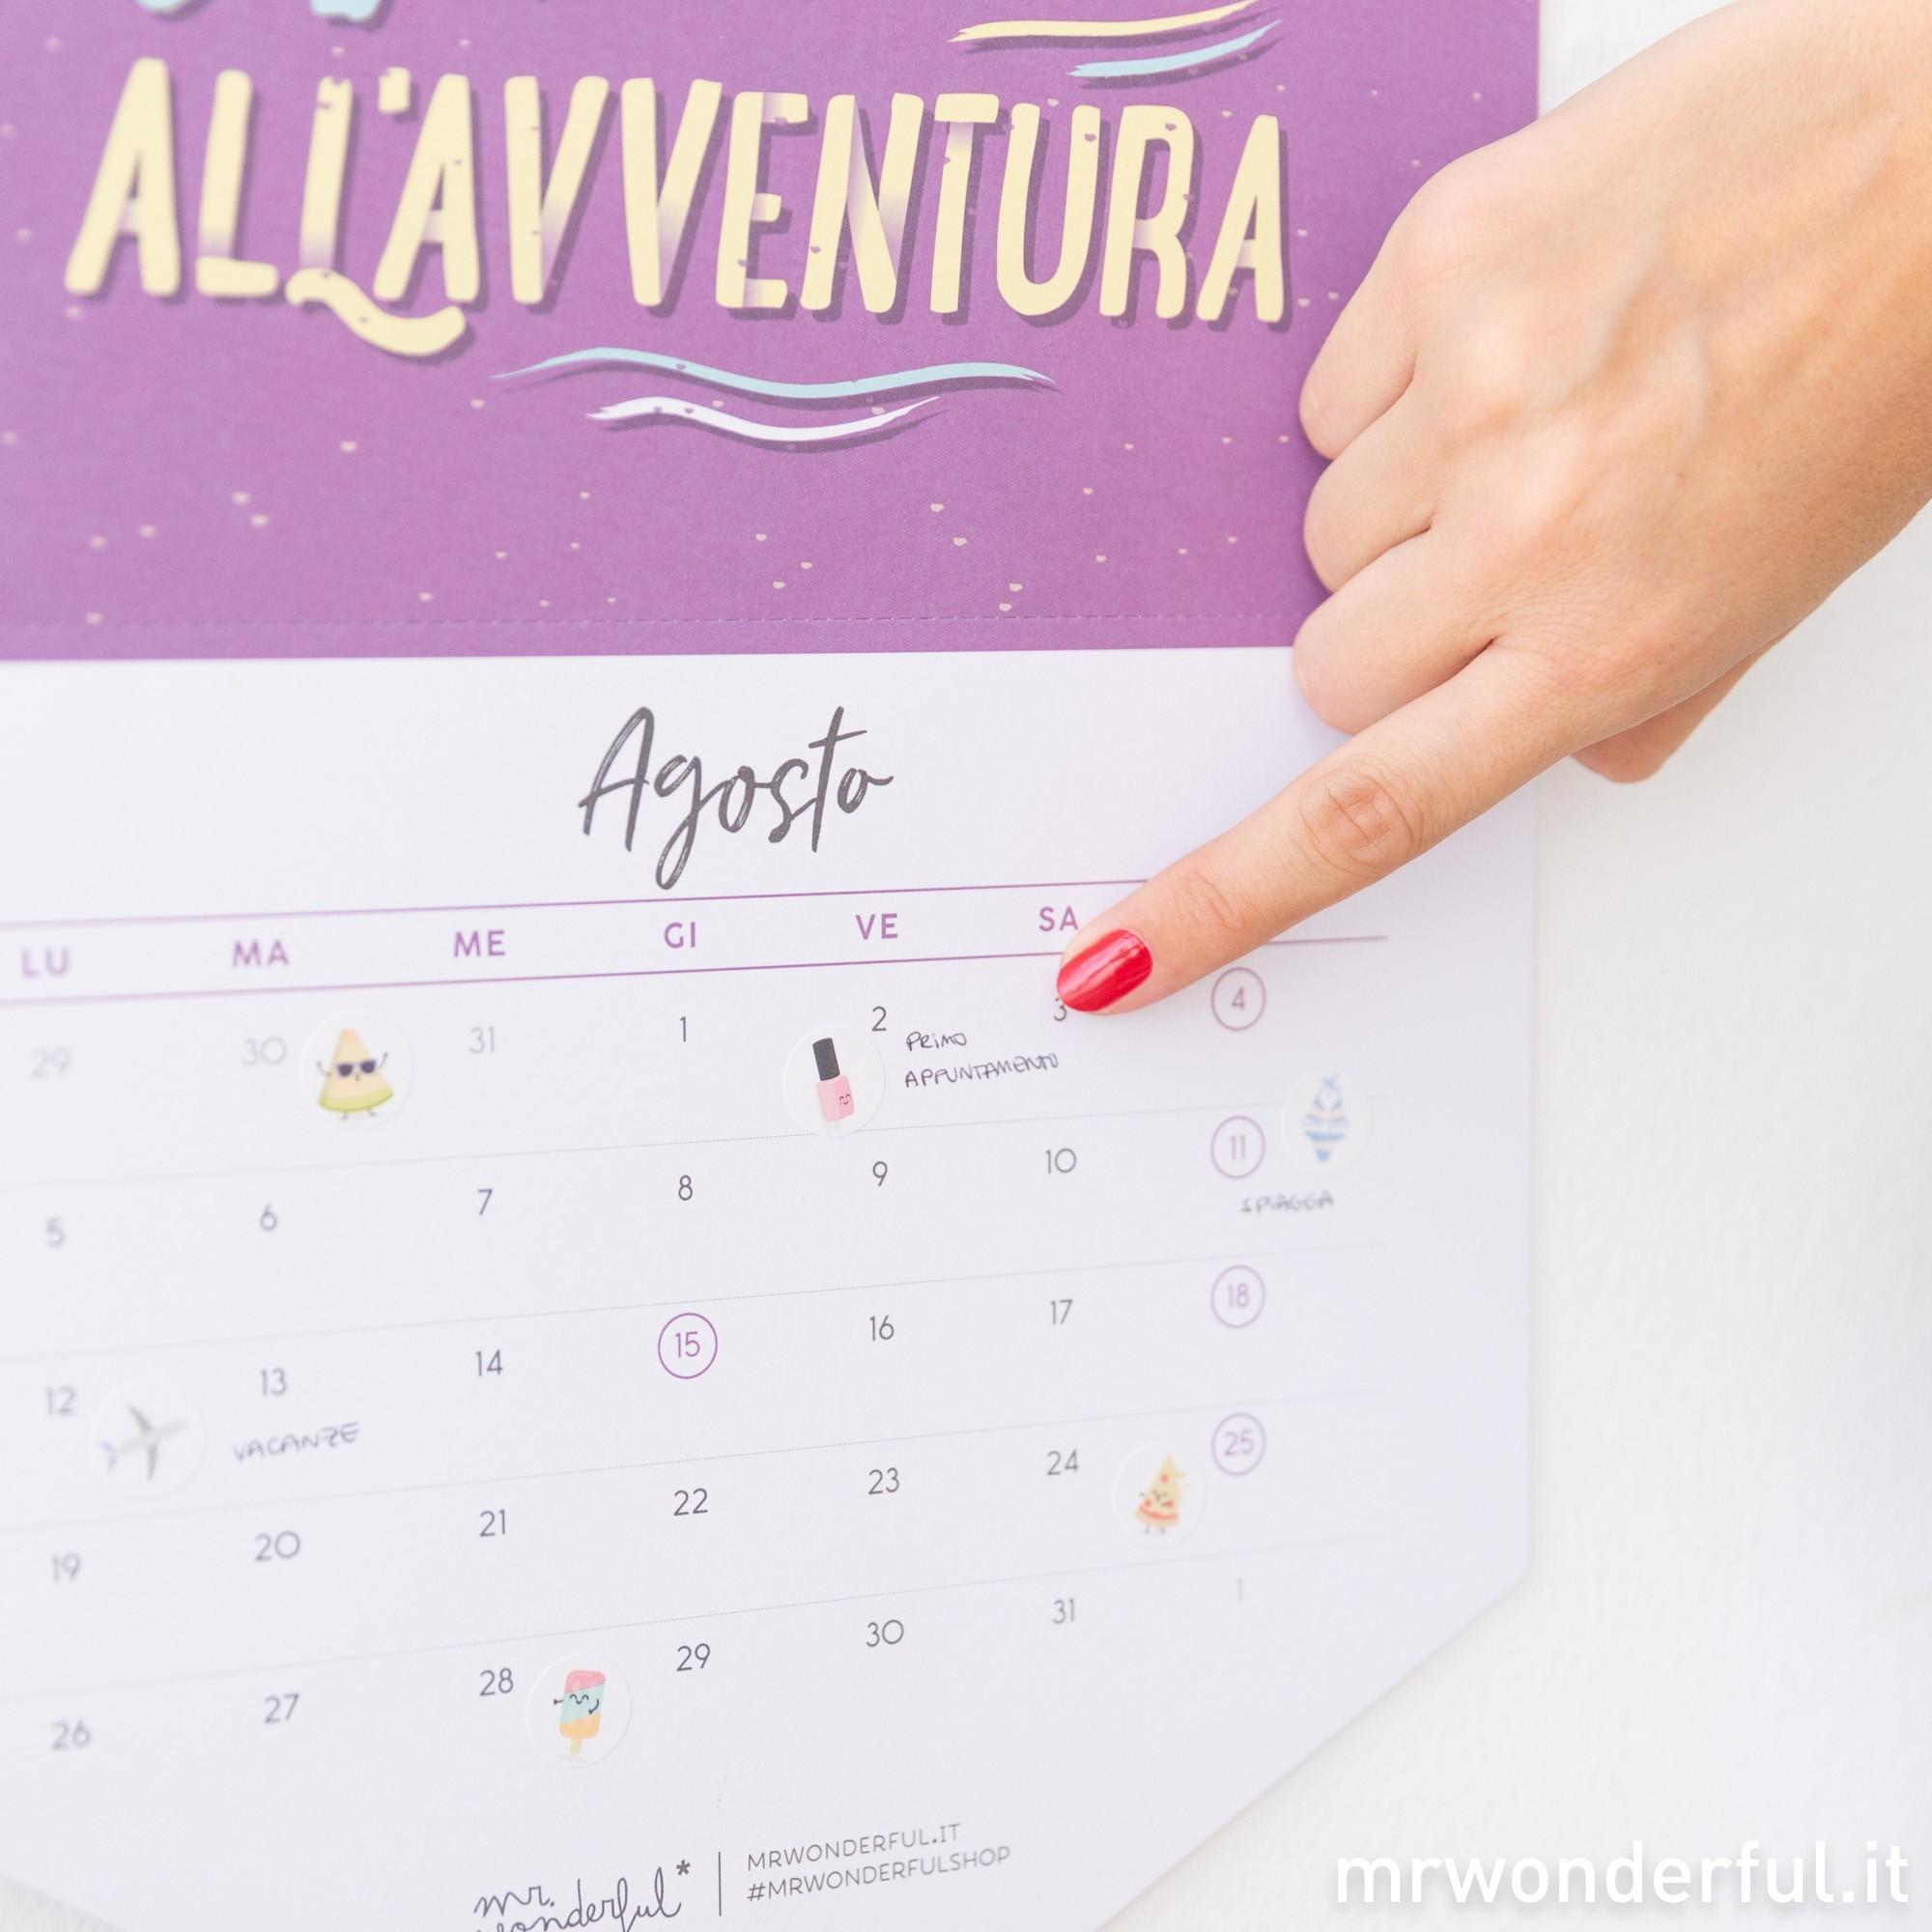 Calendario 2019 Giorni Festivi Más Populares Volta Pagina… Con Uno Dei Nostri Calendari 2019